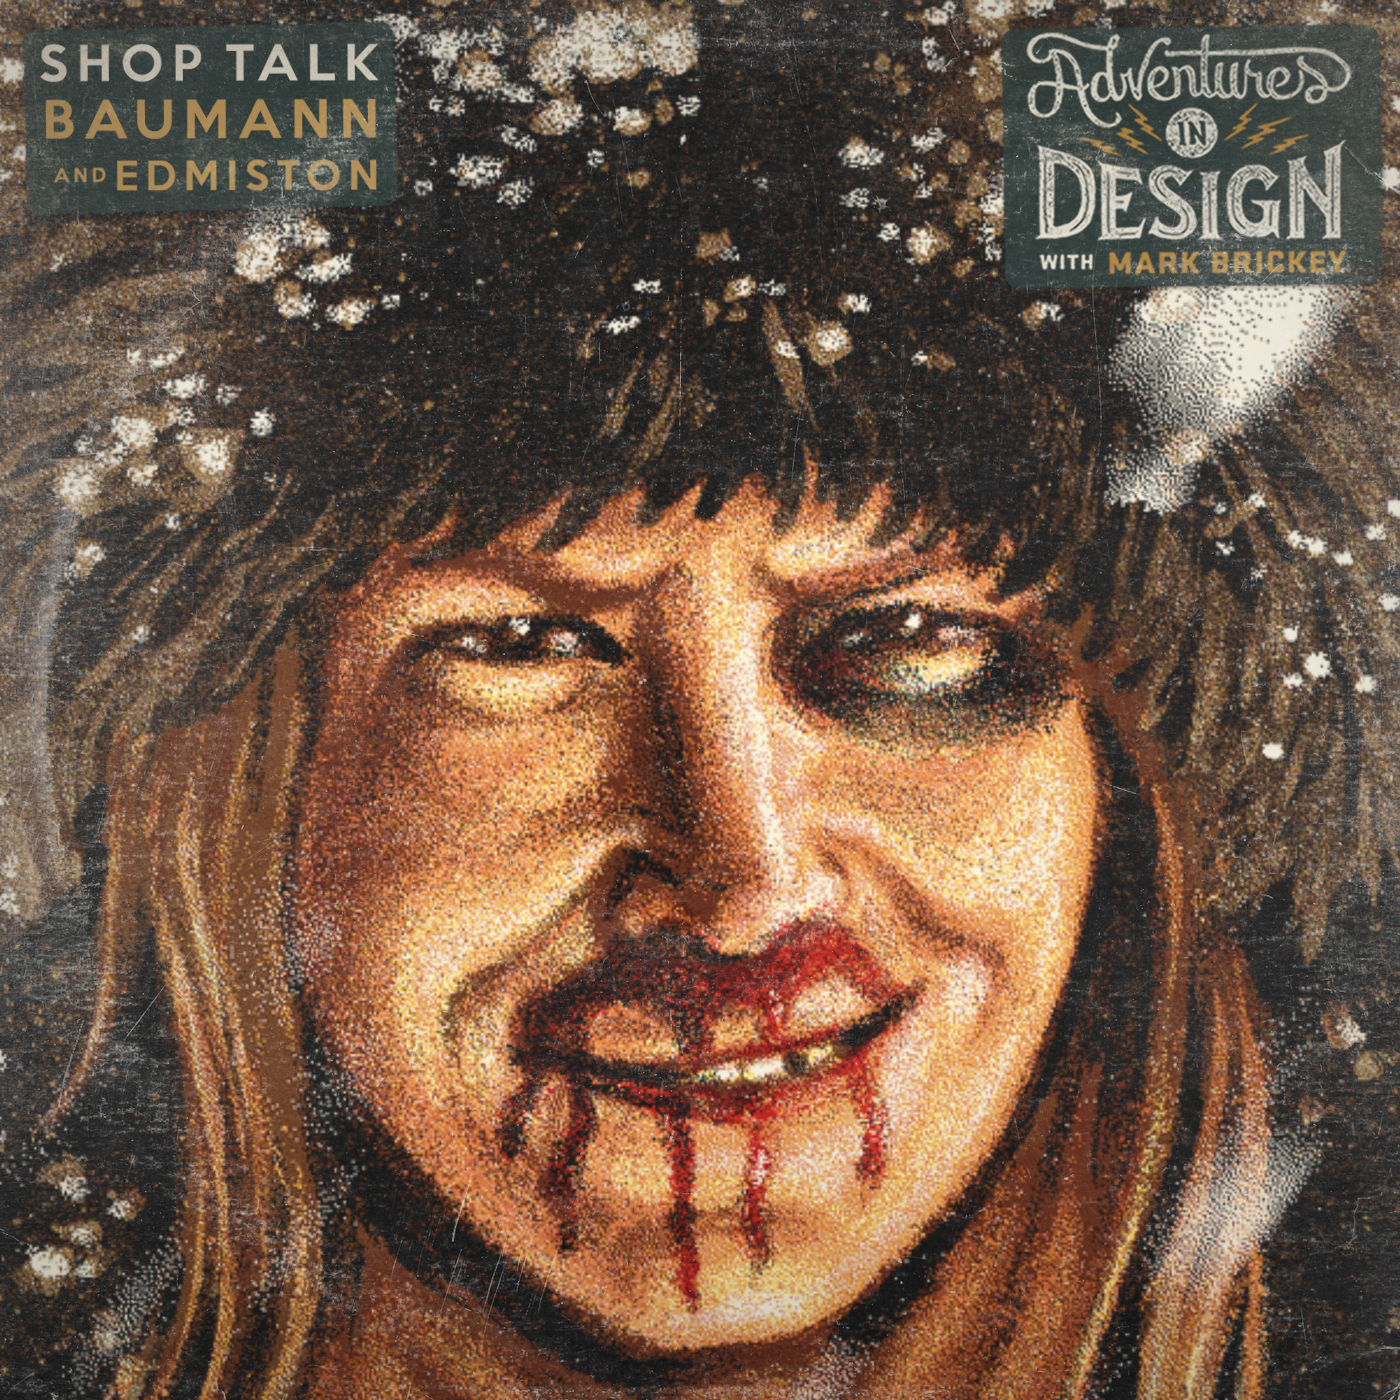 Episode 374 - Shop Talk with Billy Baumann and Jason Edmiston